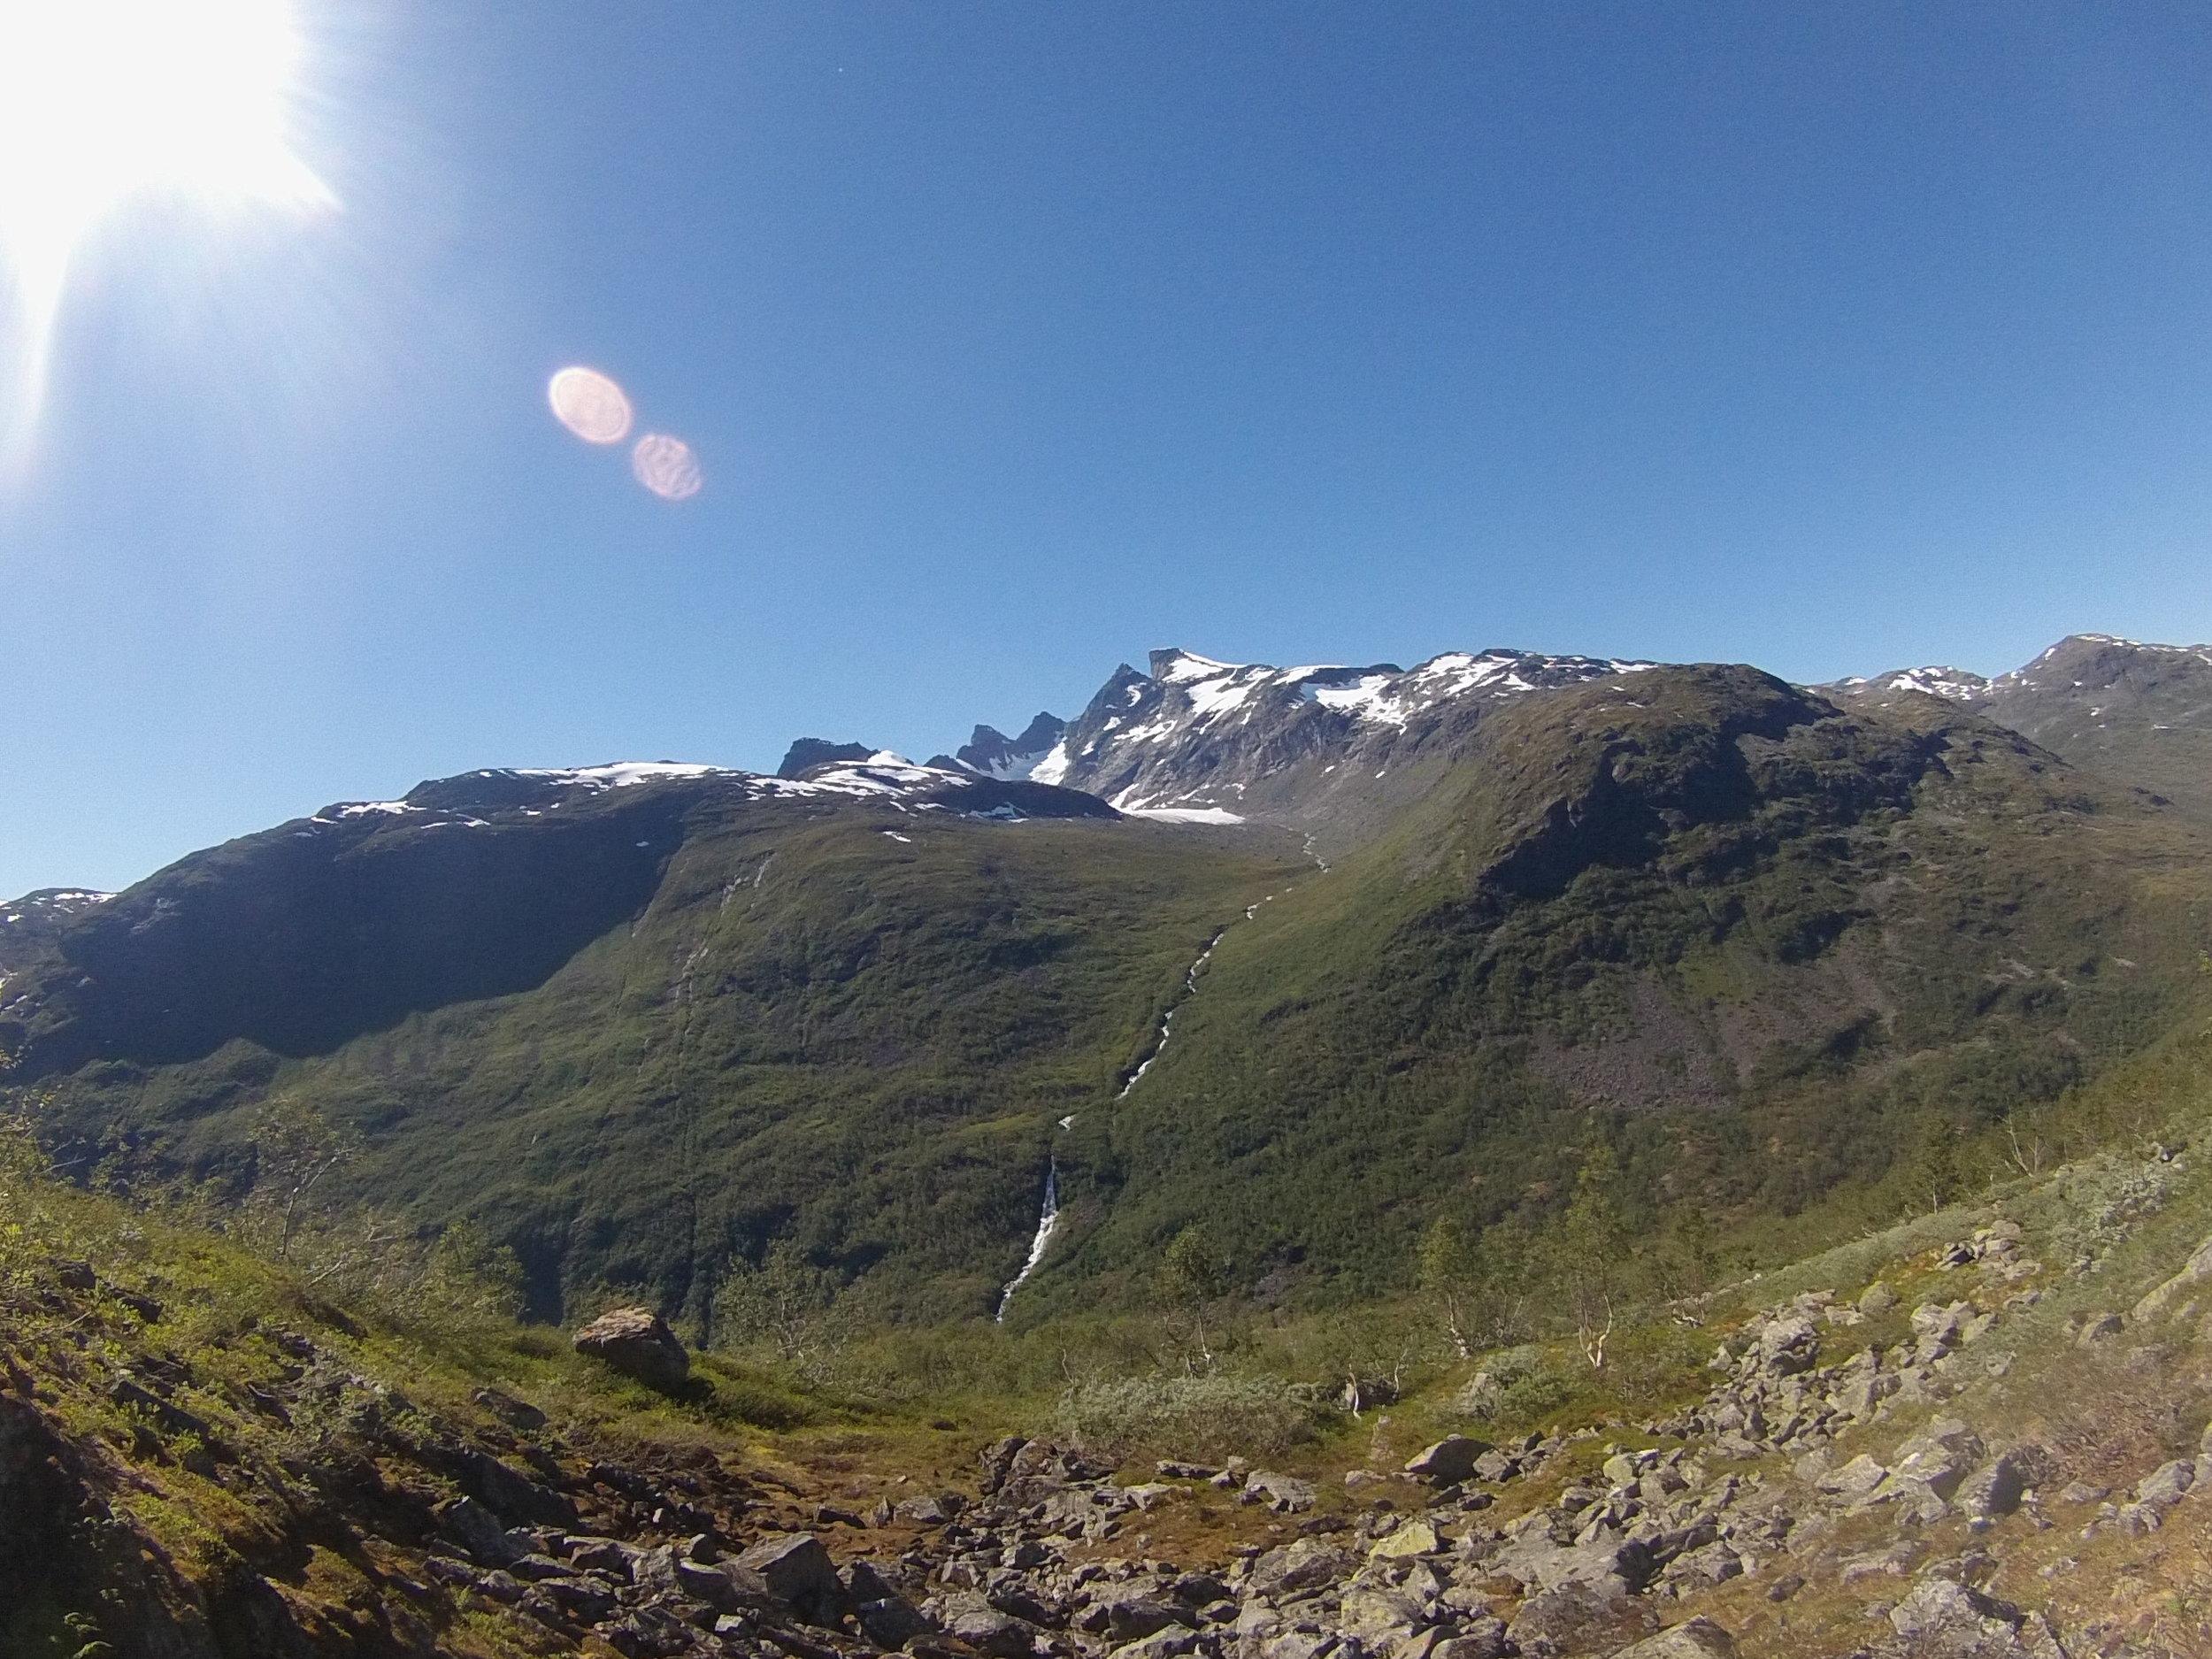 Maradalen med Maradalsbreen, Maradalstindane, Sentraltinden, Styggedalstindane og Gjertvasstind.